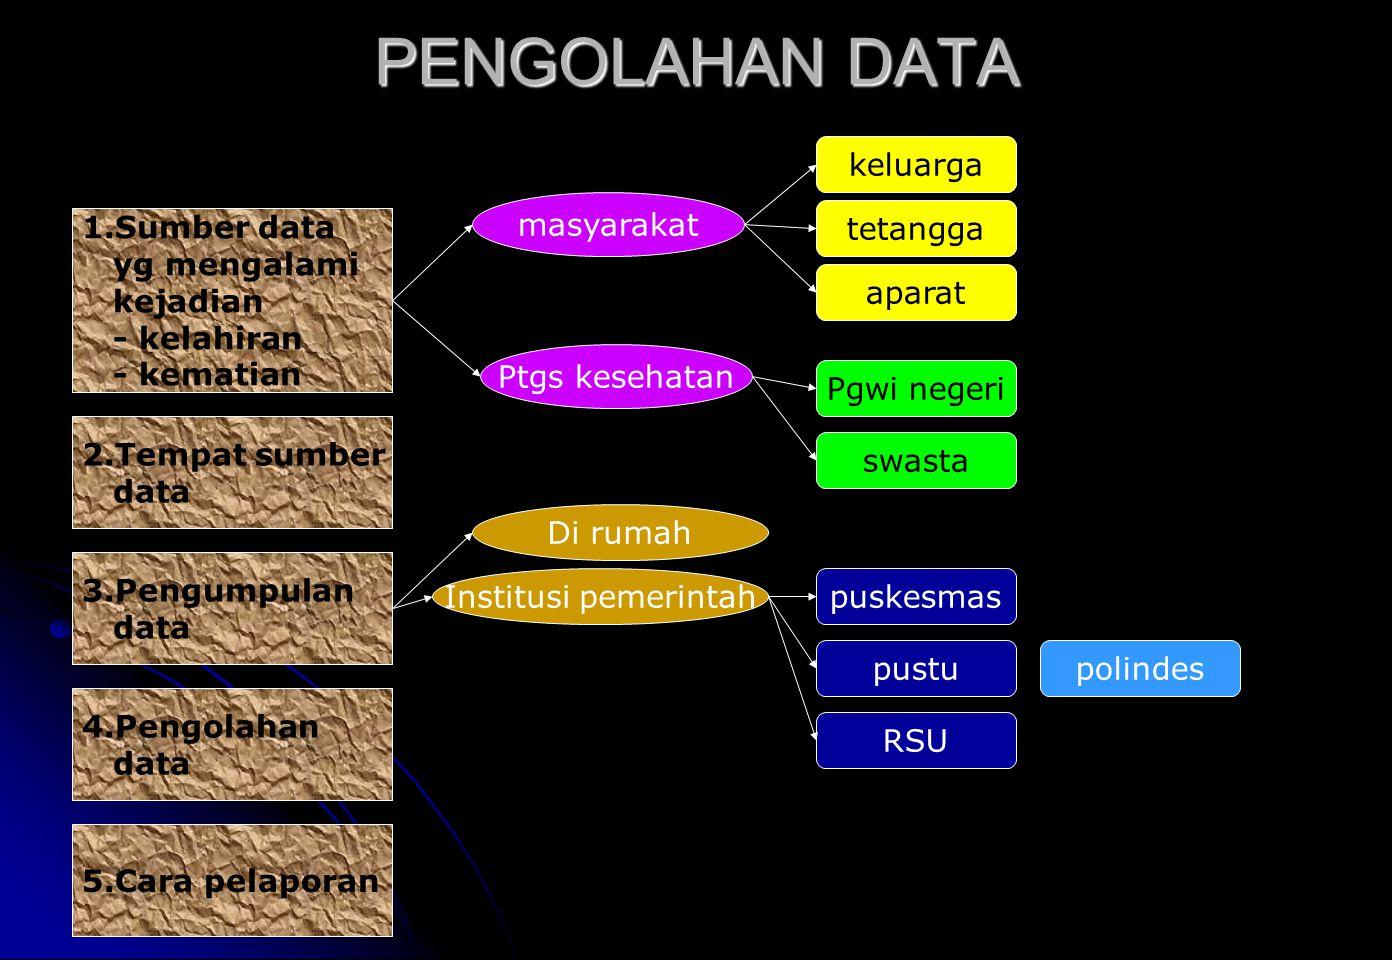 TREND PENYEBAB LANGSUNG KEMATIAN IBU DI KABUPATEN SUBANG TAHUN 2002-2006